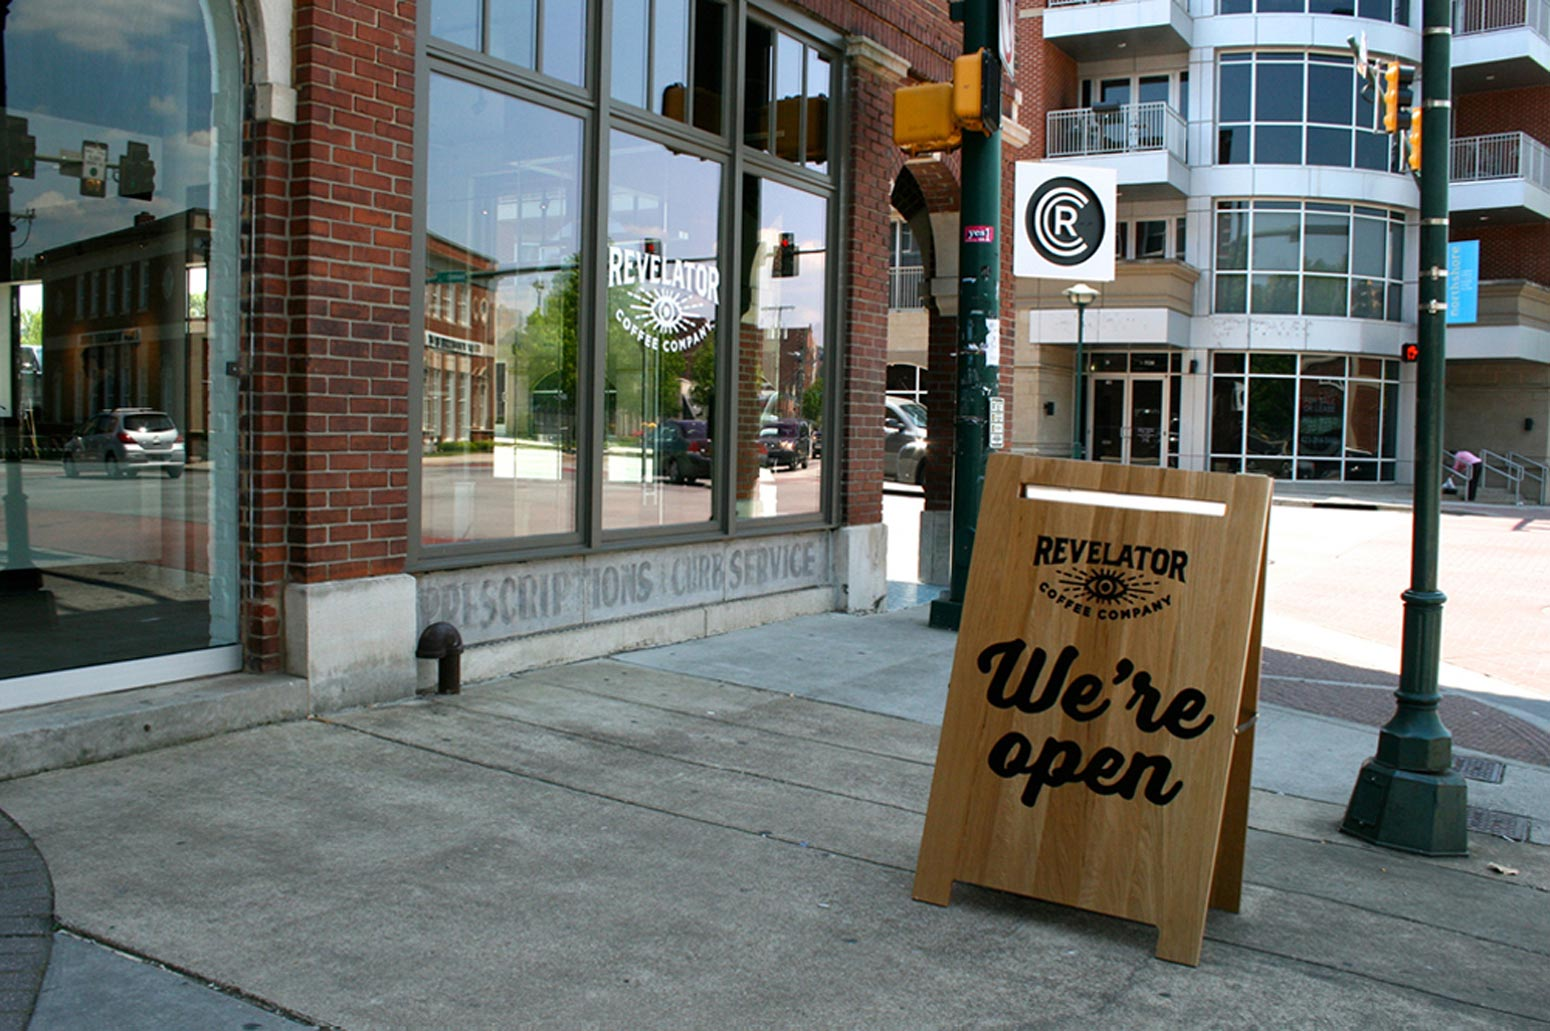 Revelator Chattanooga modern coffee shop street view of signage